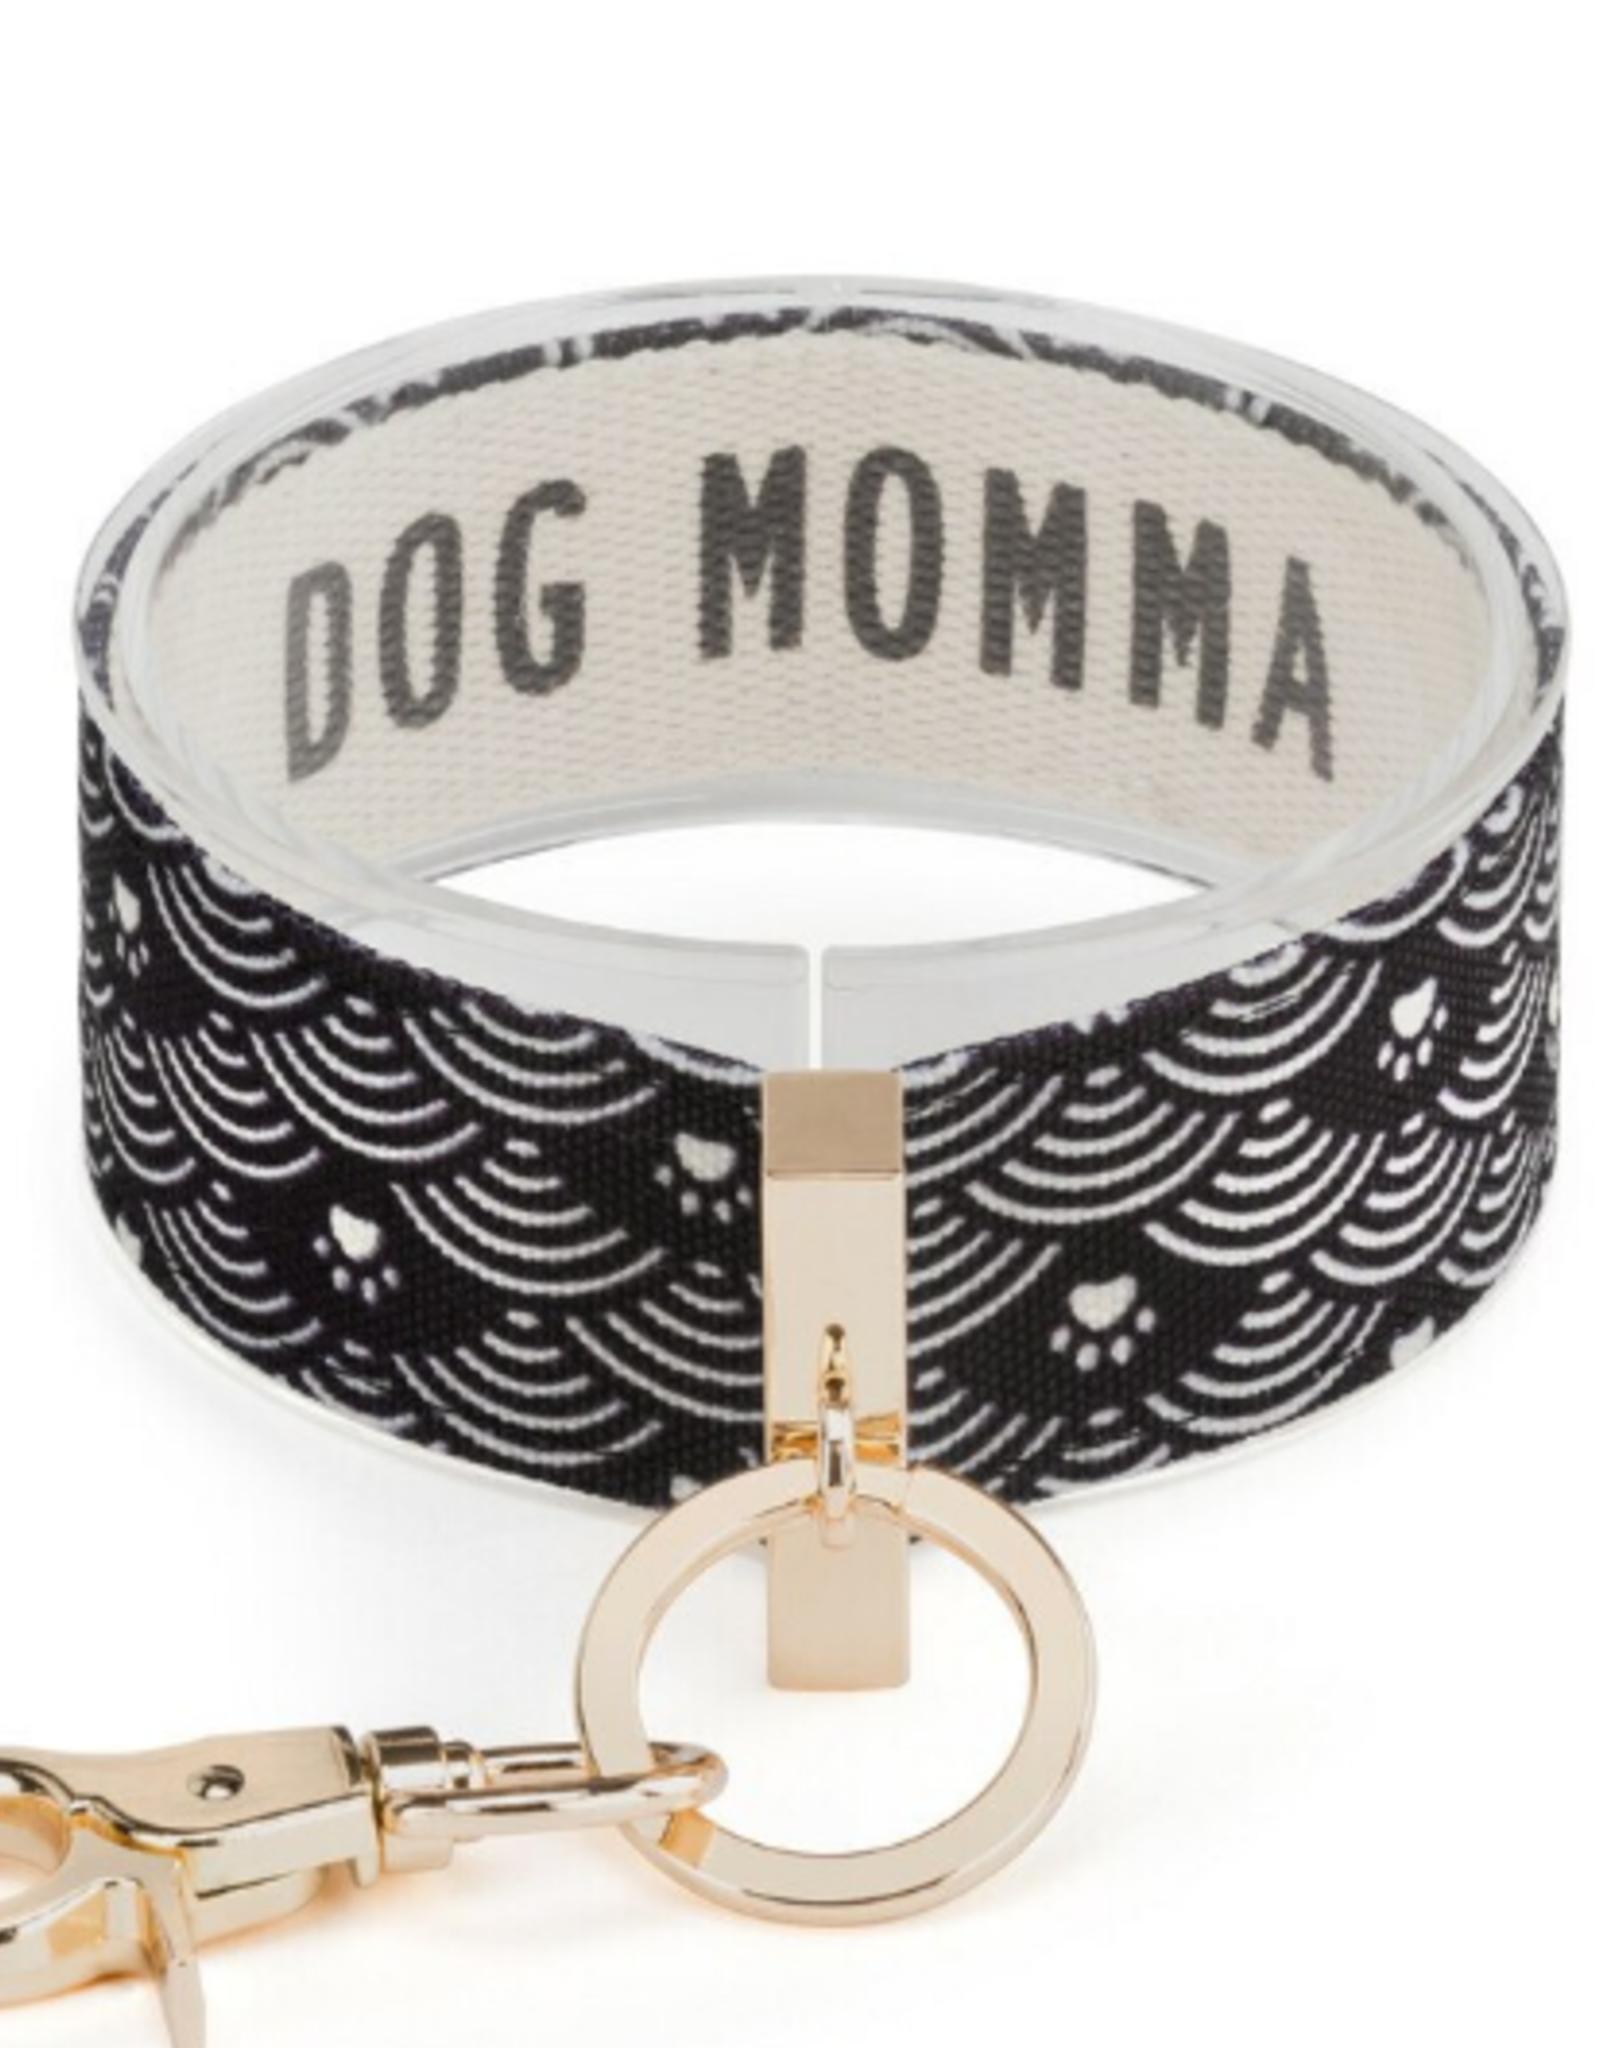 Wrist Strap Key Chain, Dog Momma